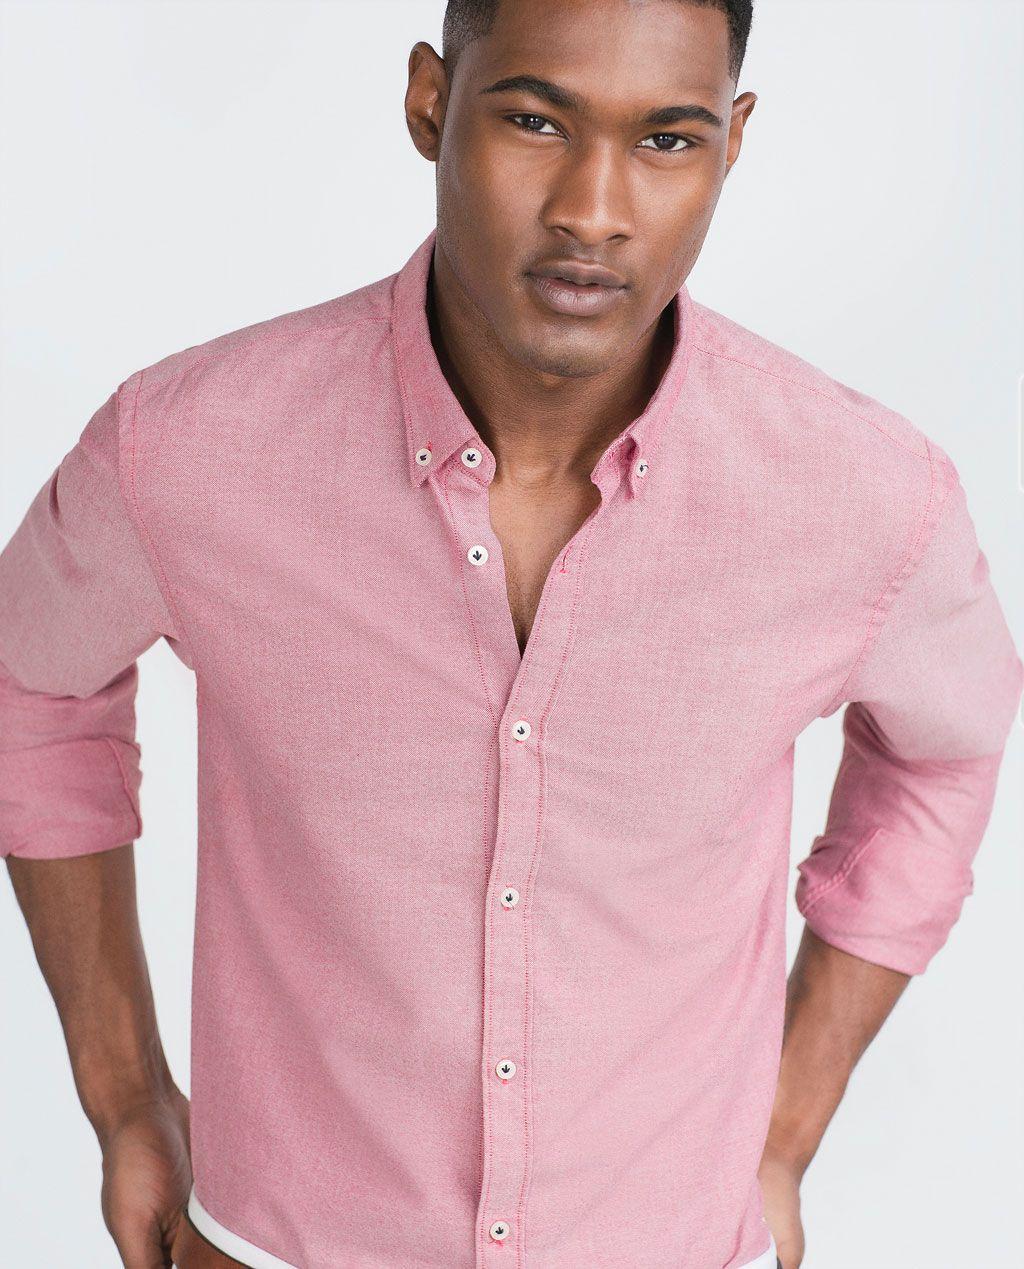 Oxford Overhemden Collectie Ss16Zara Overhemd Heren Effen Casual SUqpVLzMG